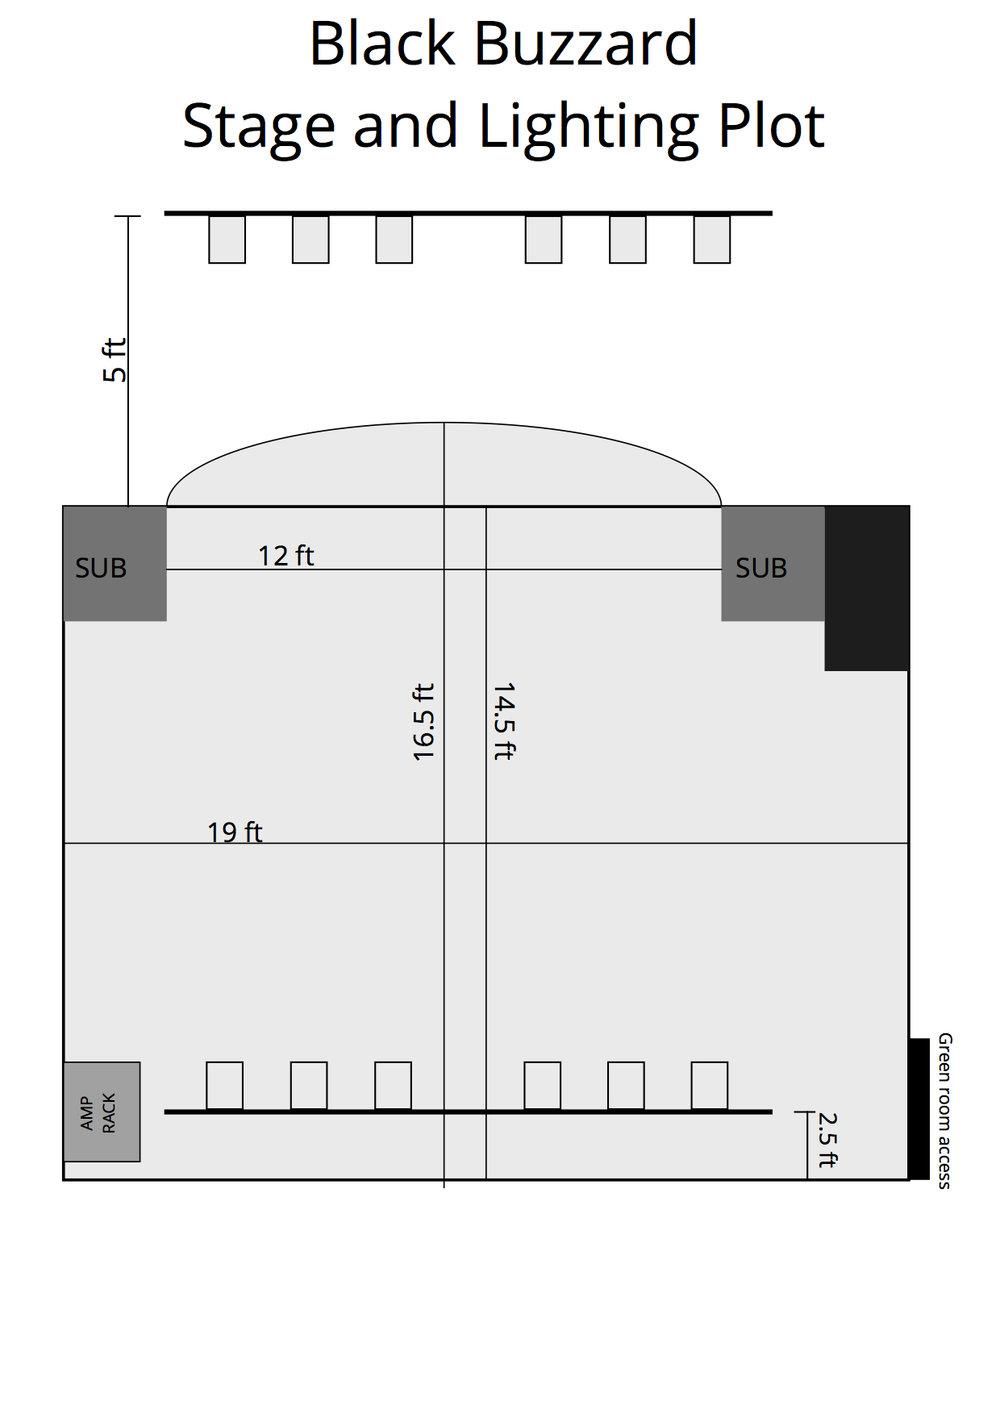 Bb_Stage and Lighting Plot.jpg